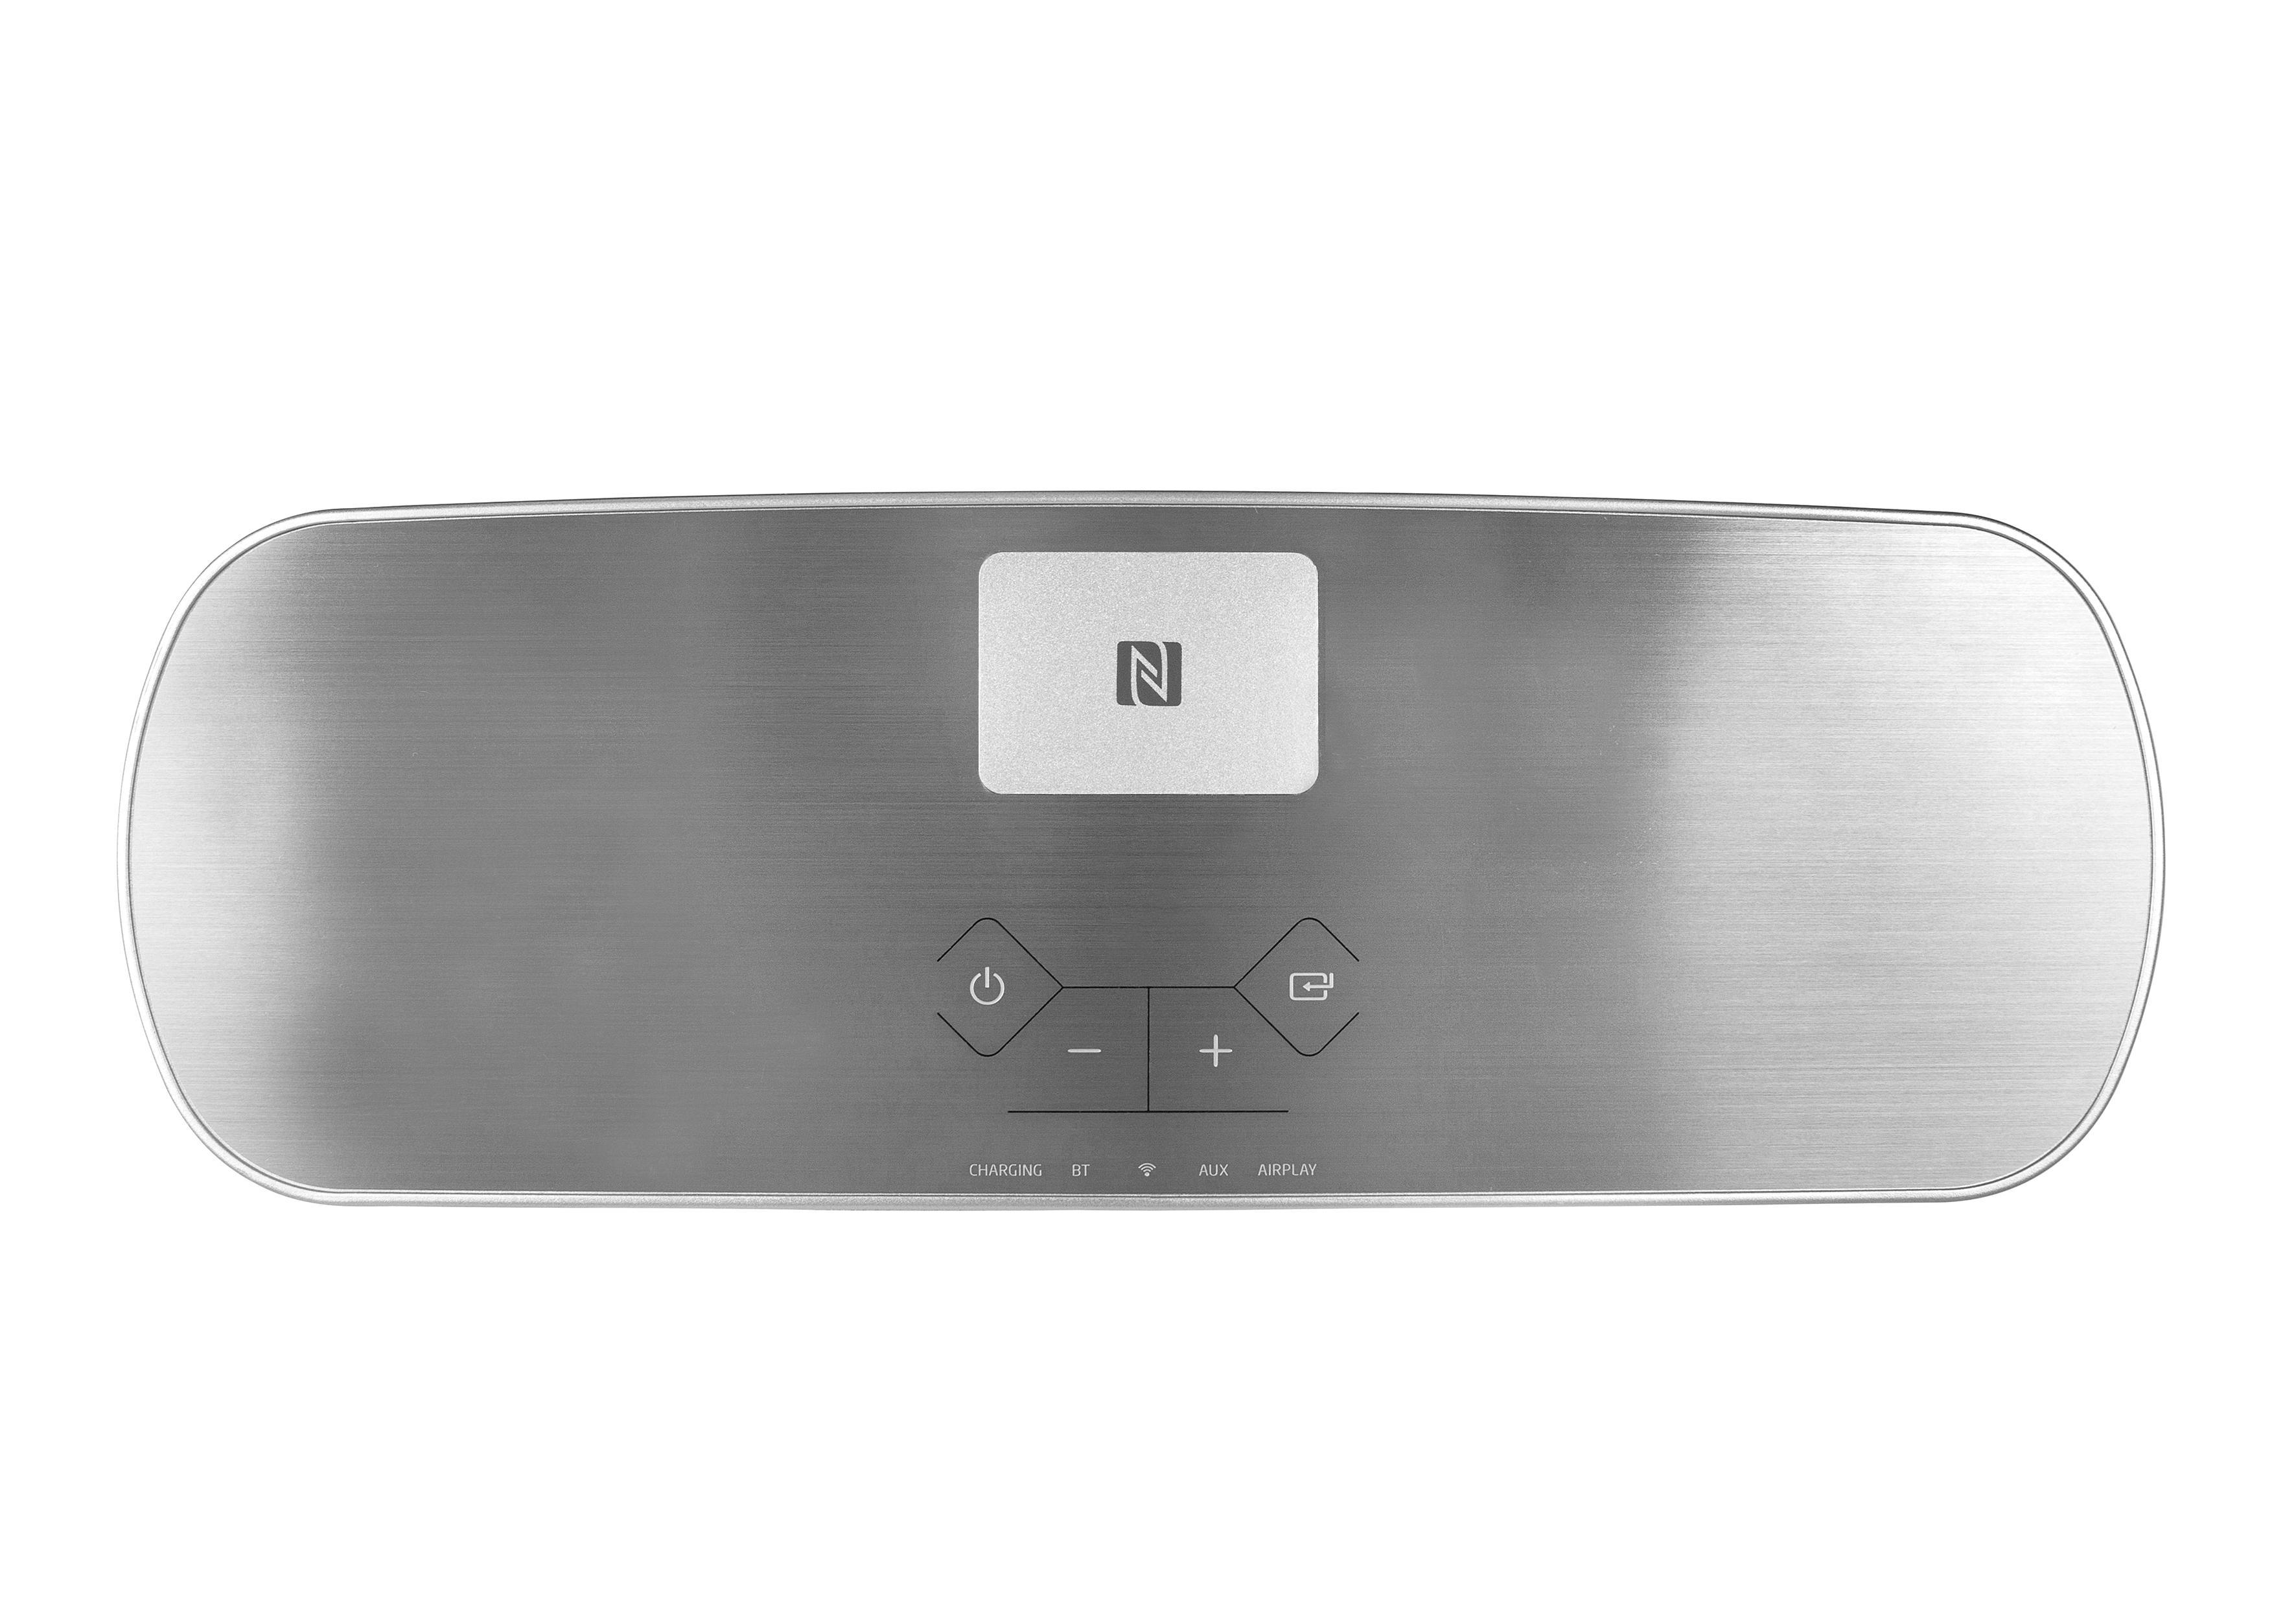 blaupunkt wf 500 wifi lautsprecher mit wlan airplay. Black Bedroom Furniture Sets. Home Design Ideas